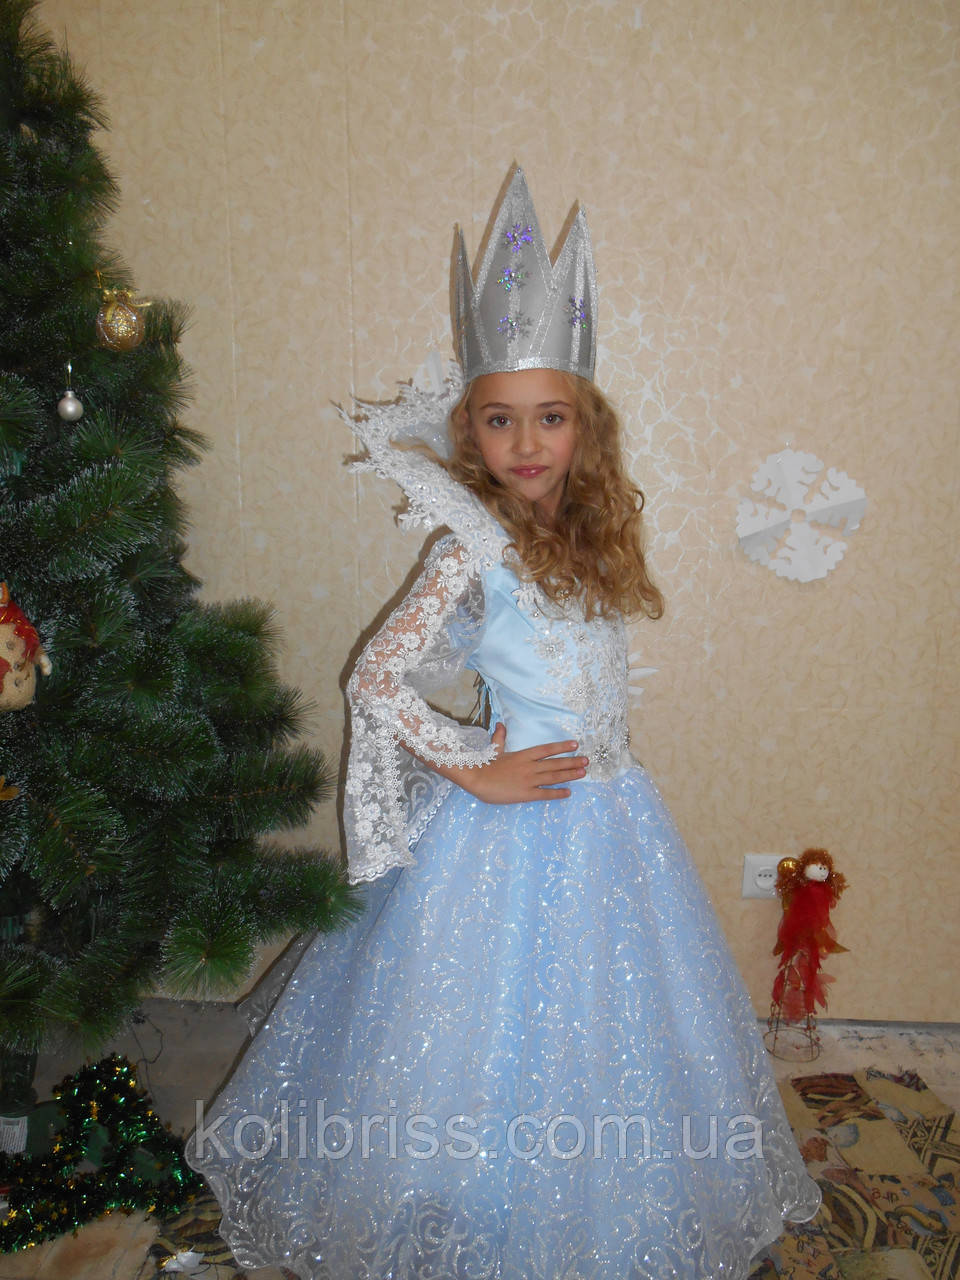 Фото снежная королева своими руками